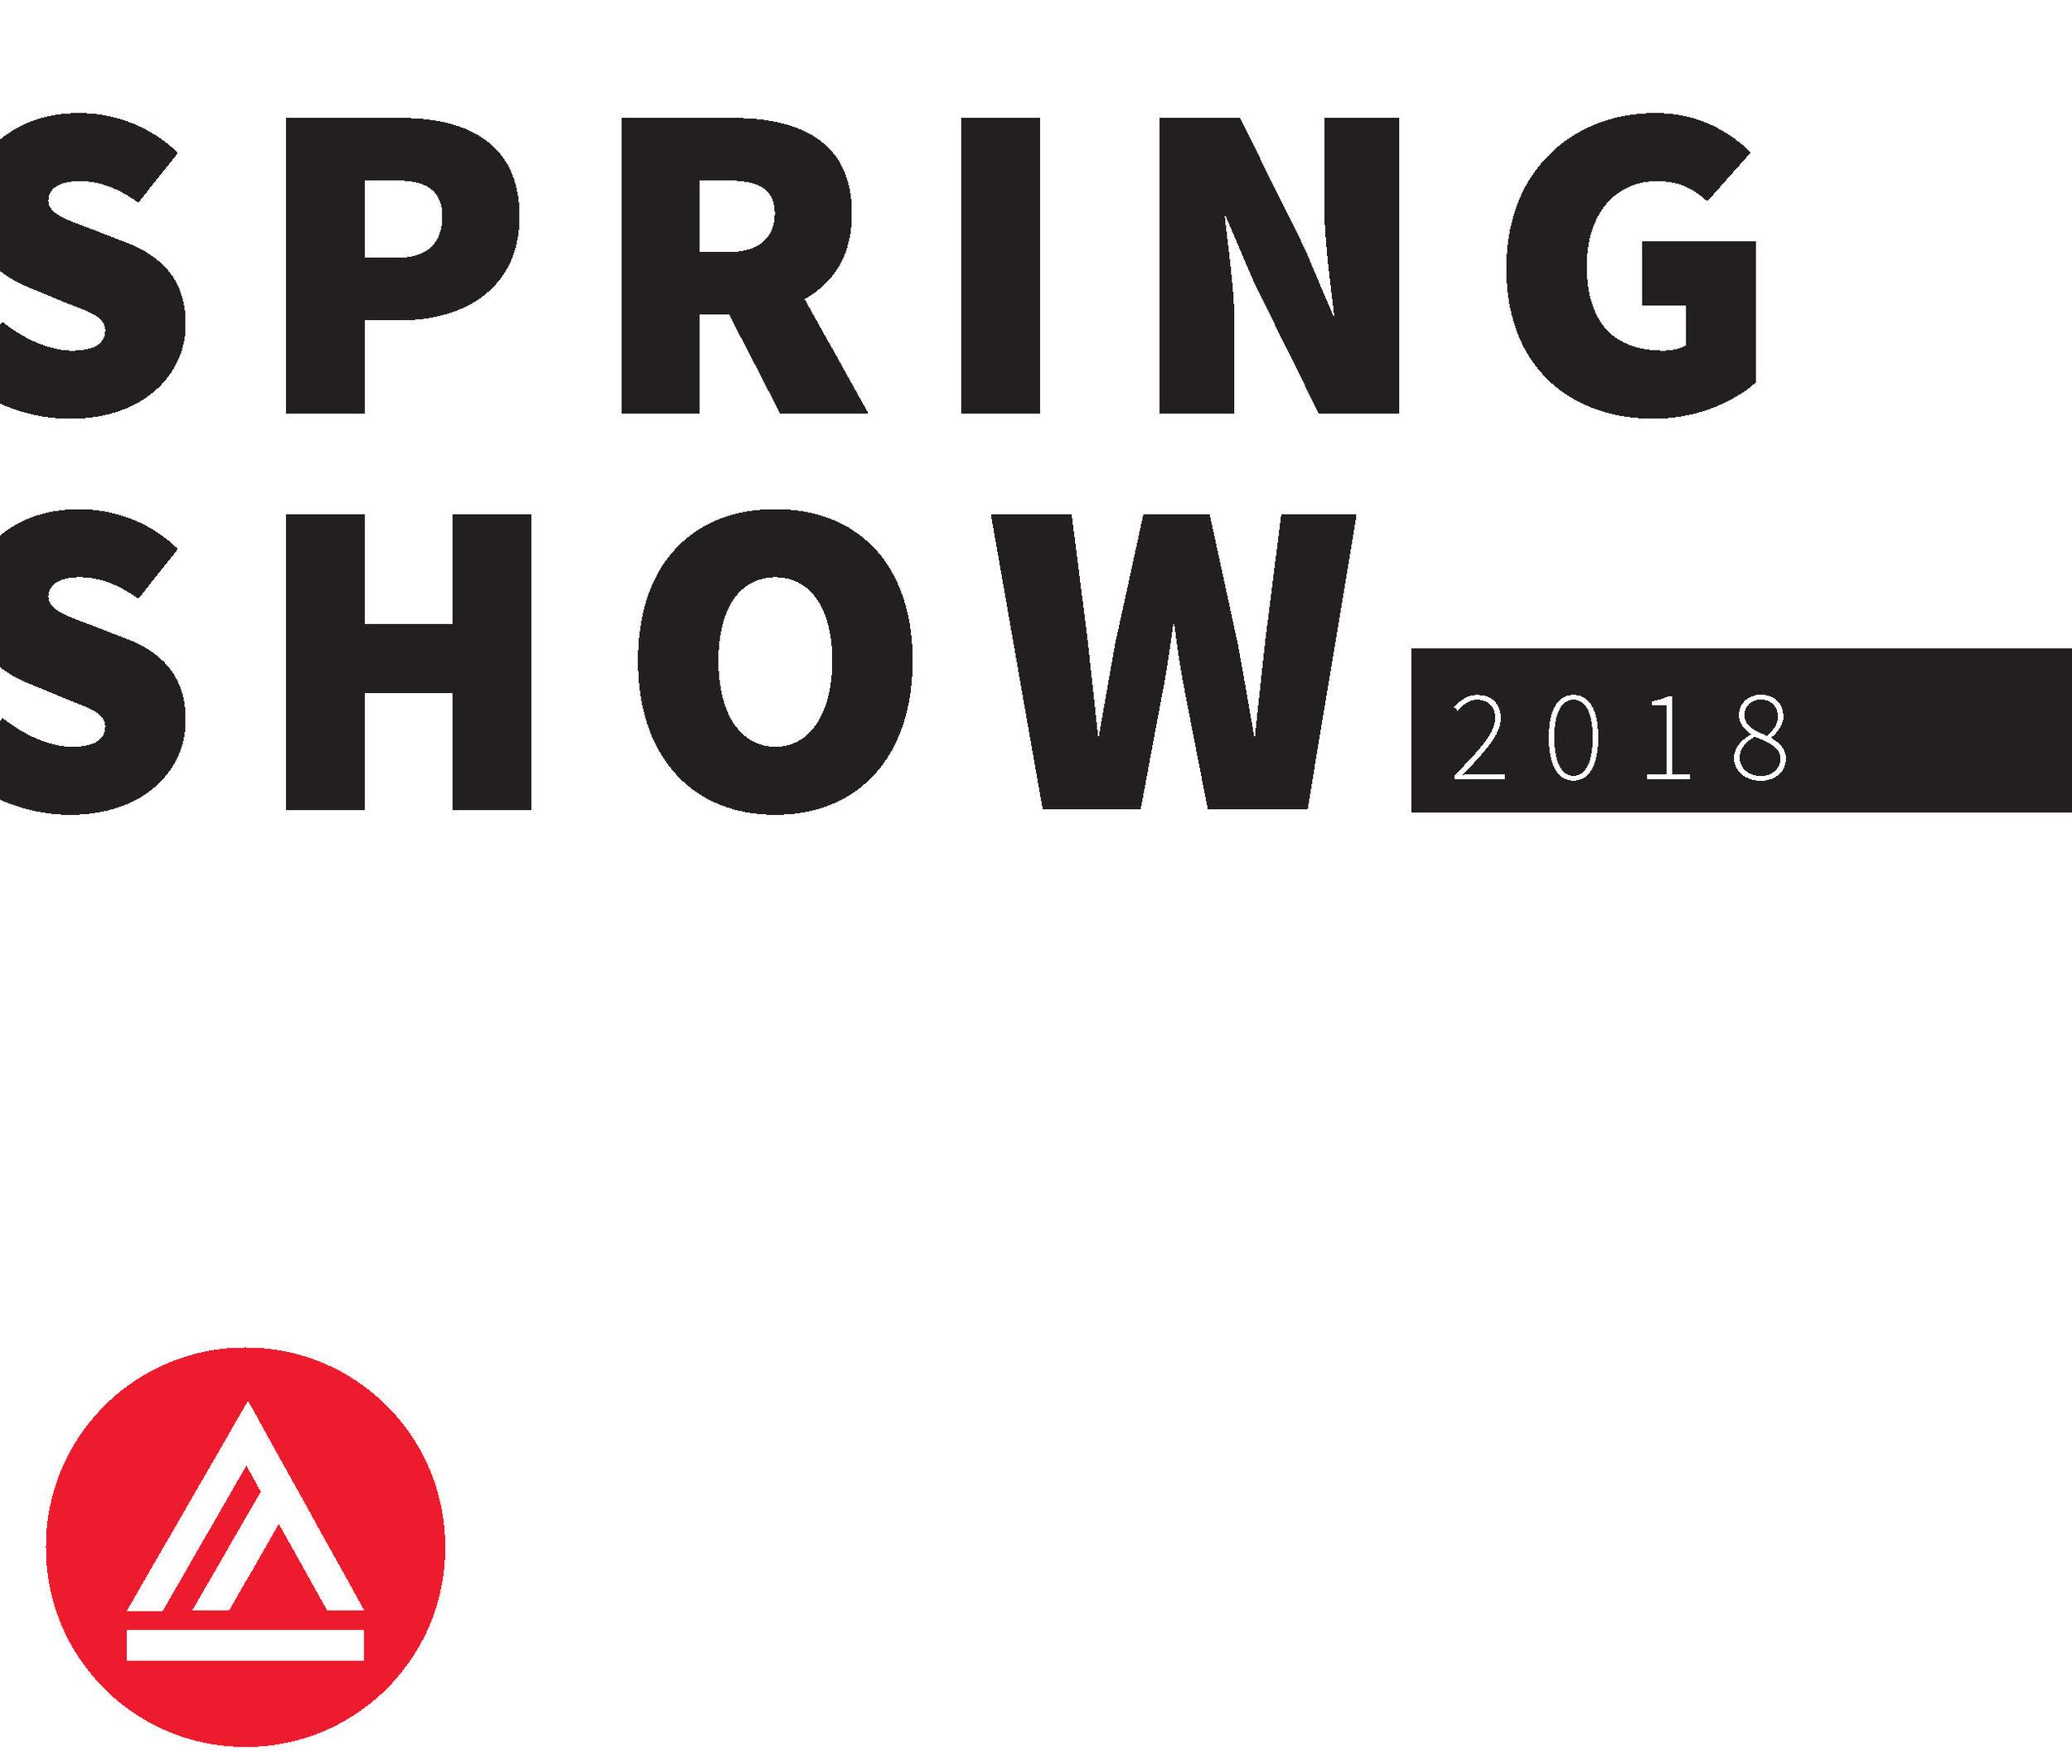 Spring Show Guide